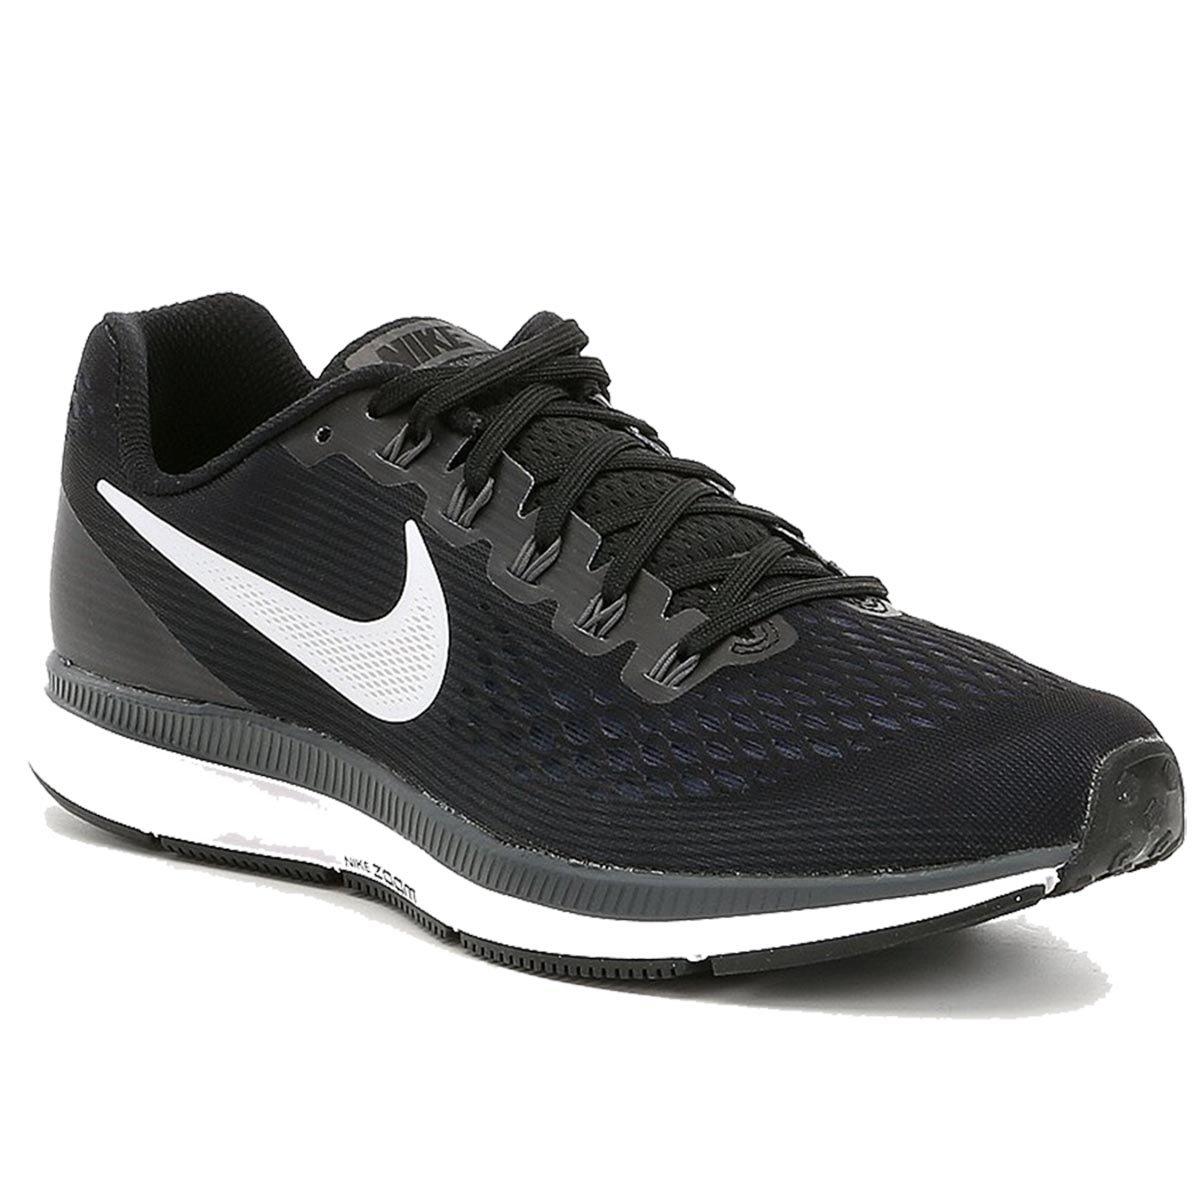 info for ec307 95a15 Nike Air Zoom Pegasus 34 Running Shoes (Black/White/Grey)